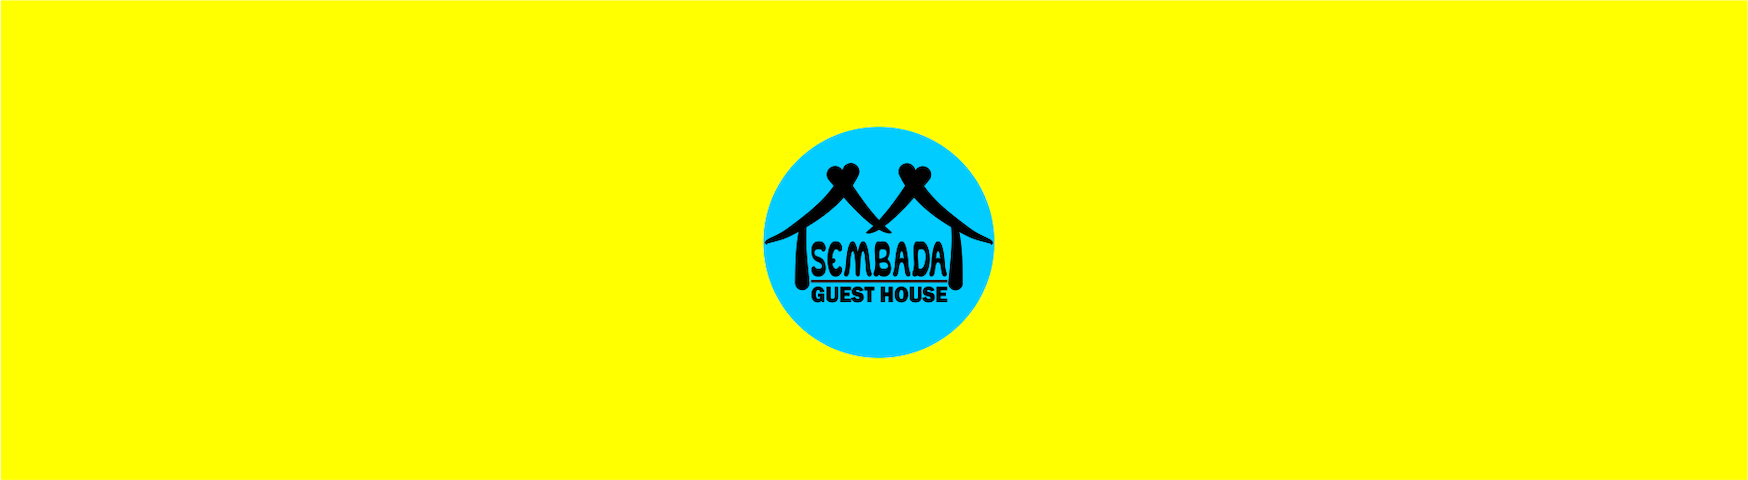 Sembada House